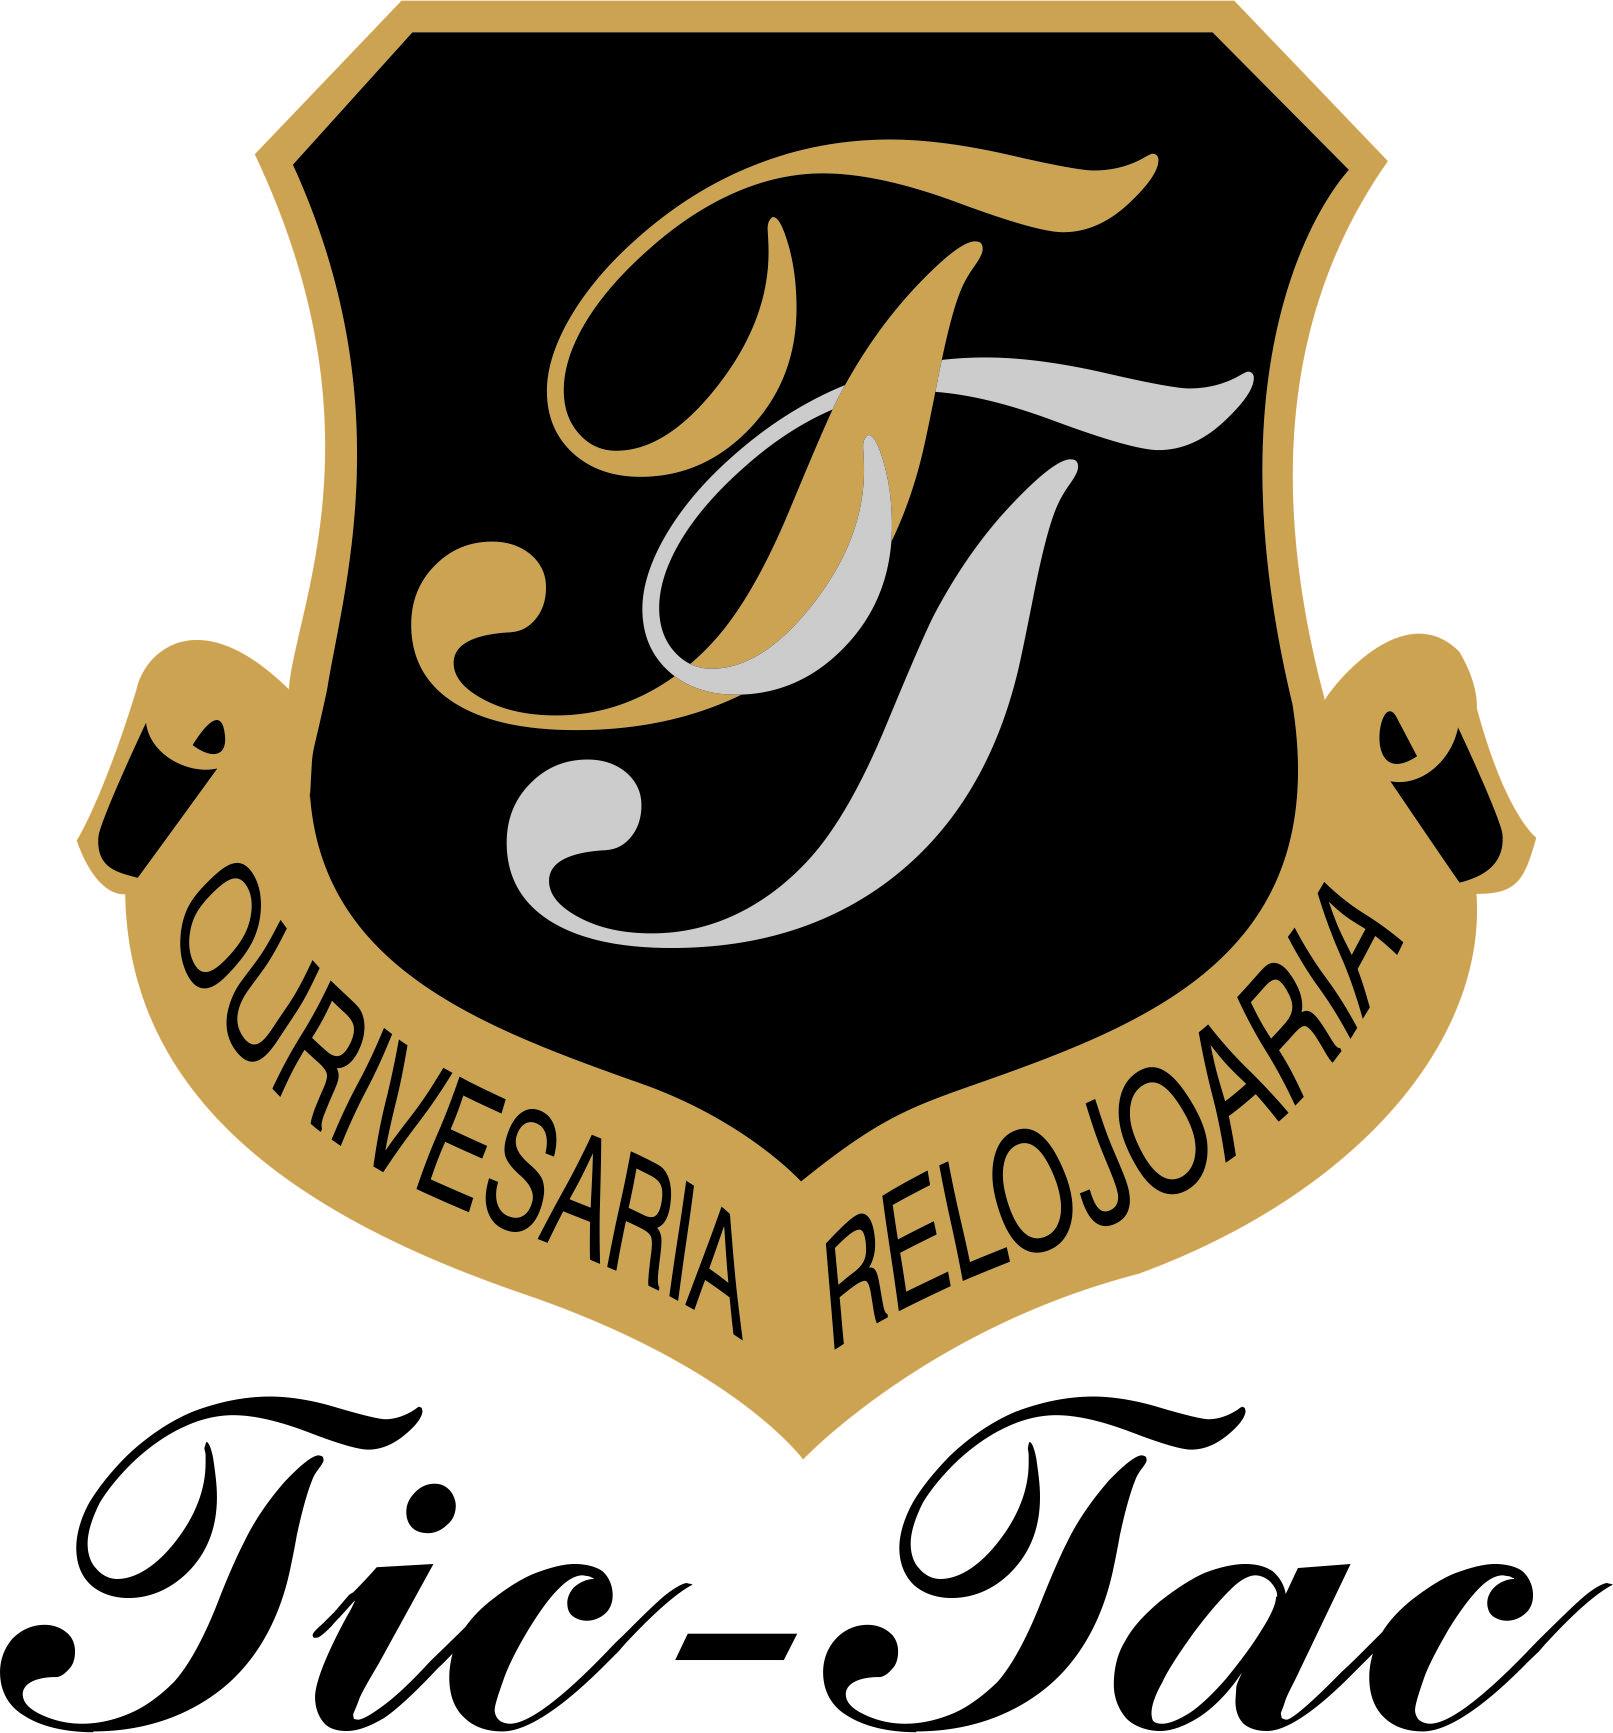 Tic Tac Ourivesaria